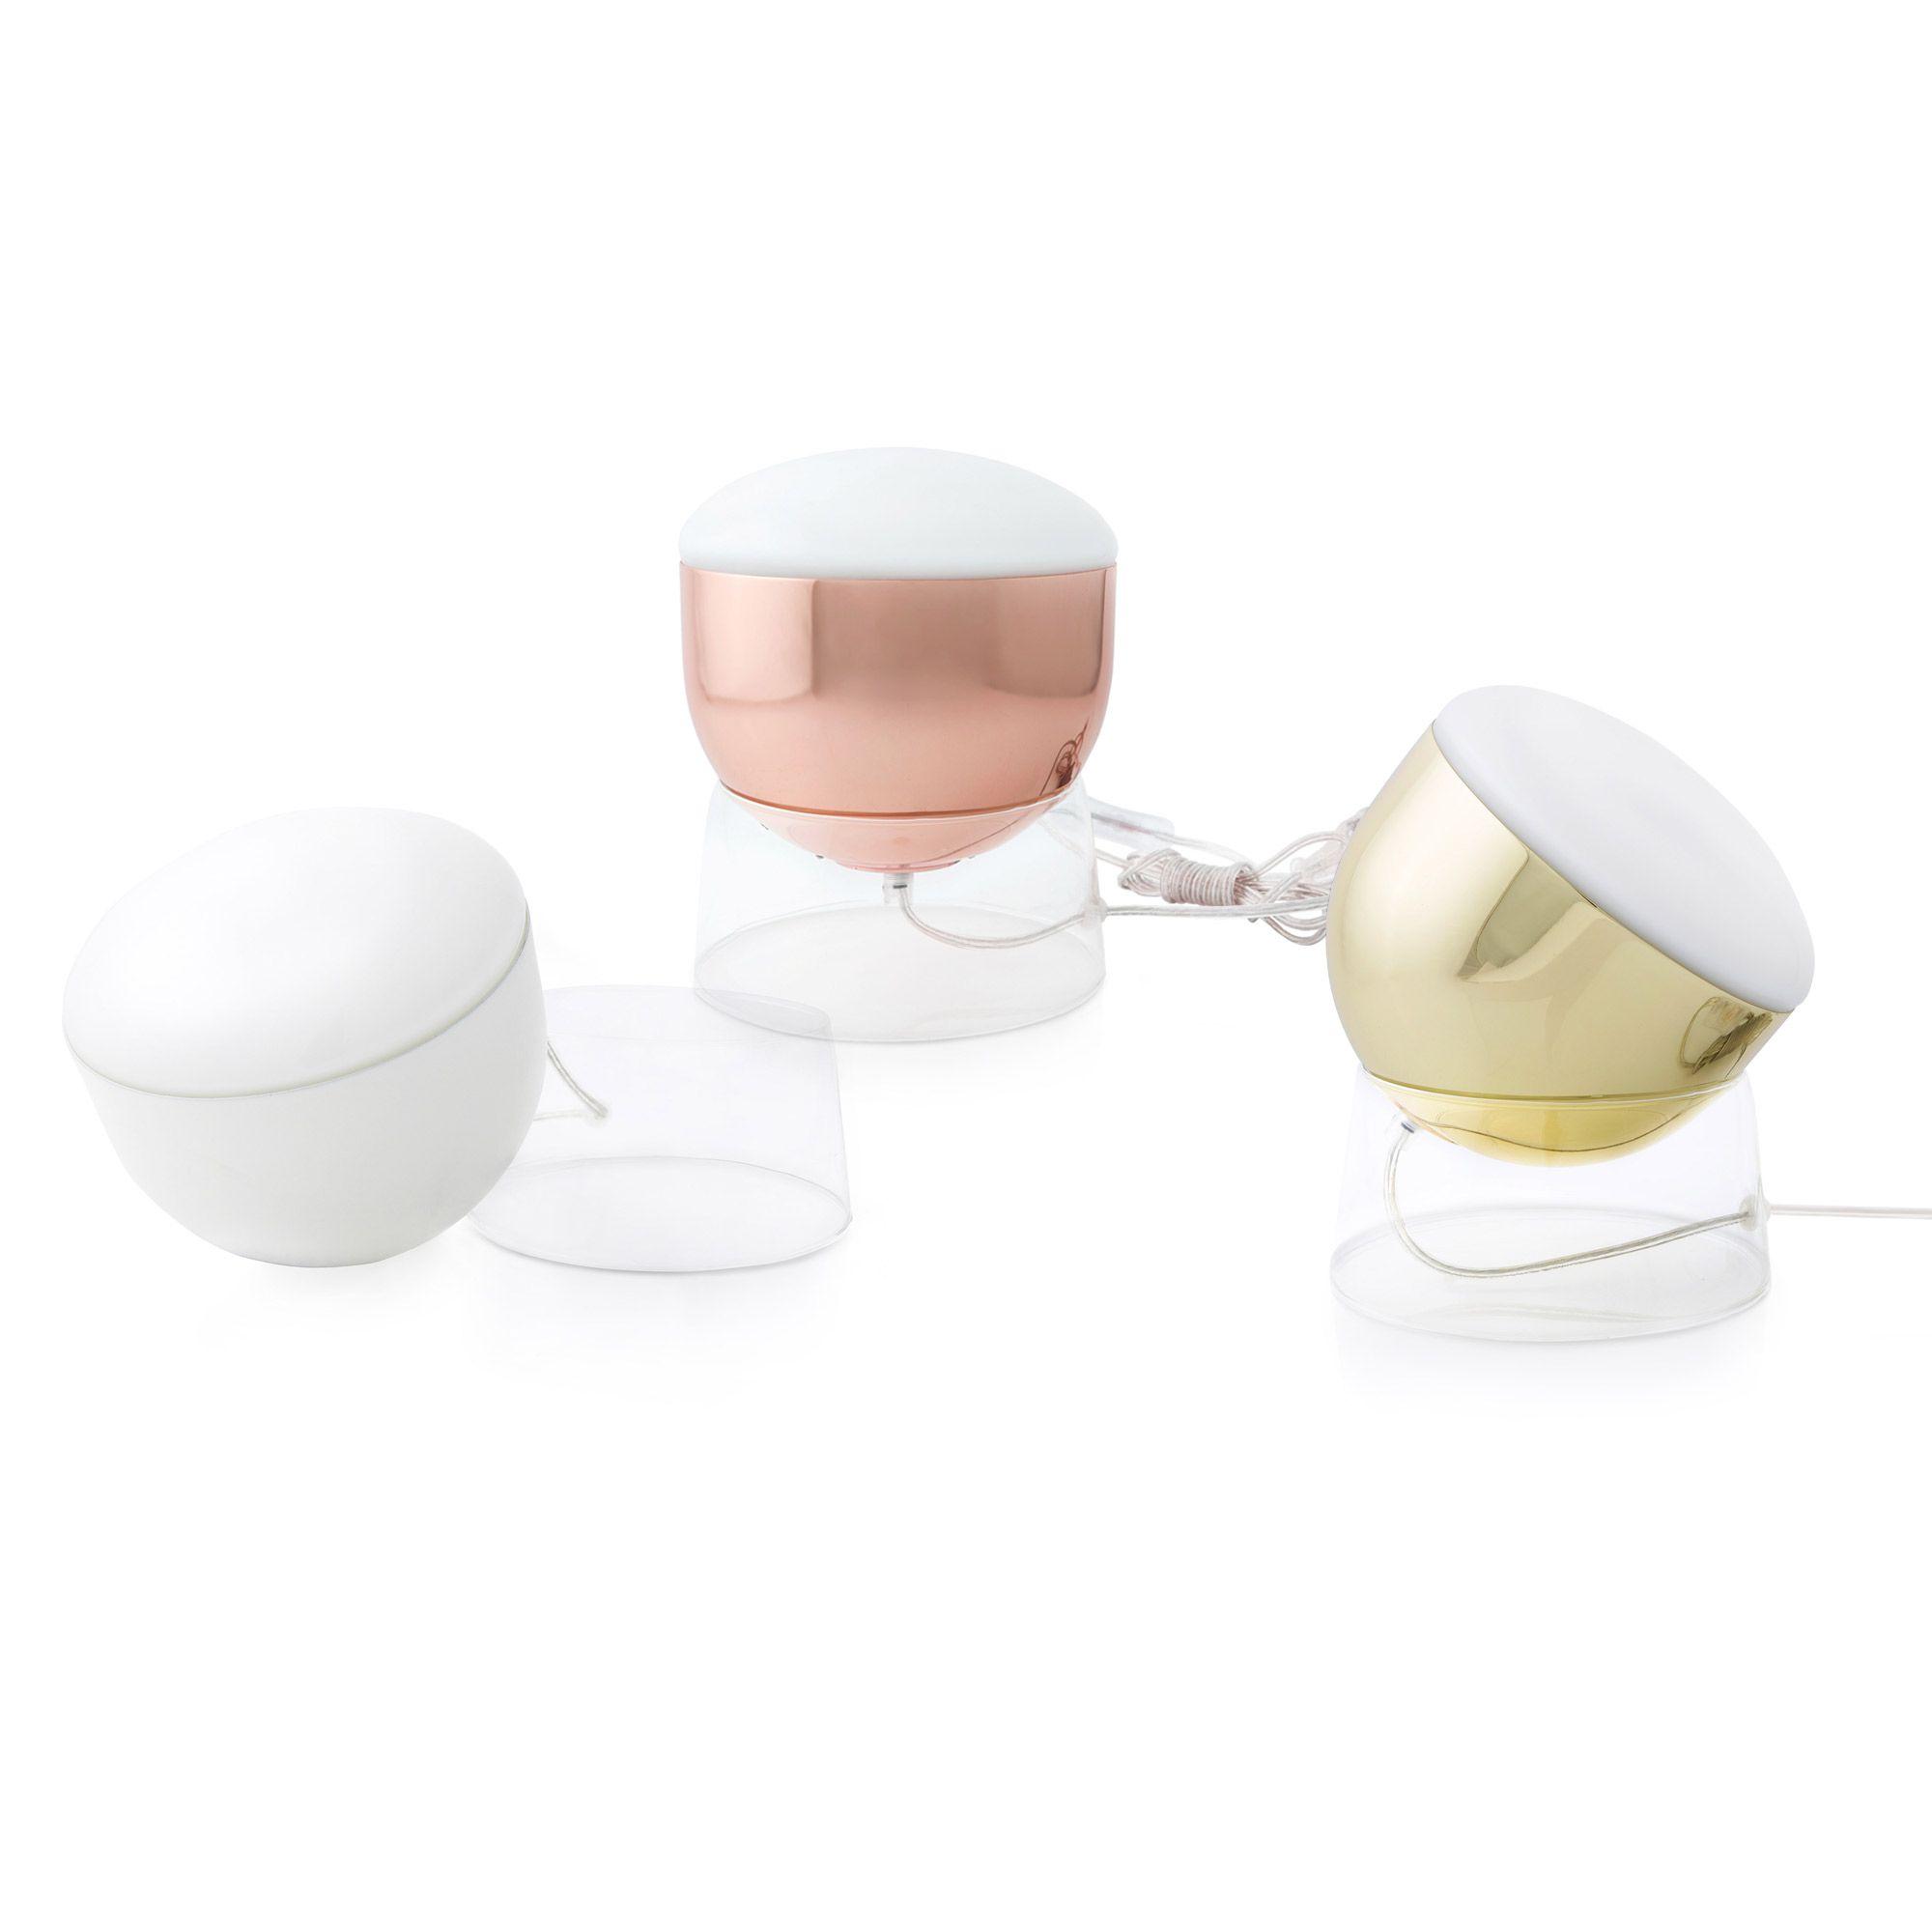 Poser Orientable Transparent Glossy Blancbase Verre À Lampe Ø18cm uwiXTOPkZ